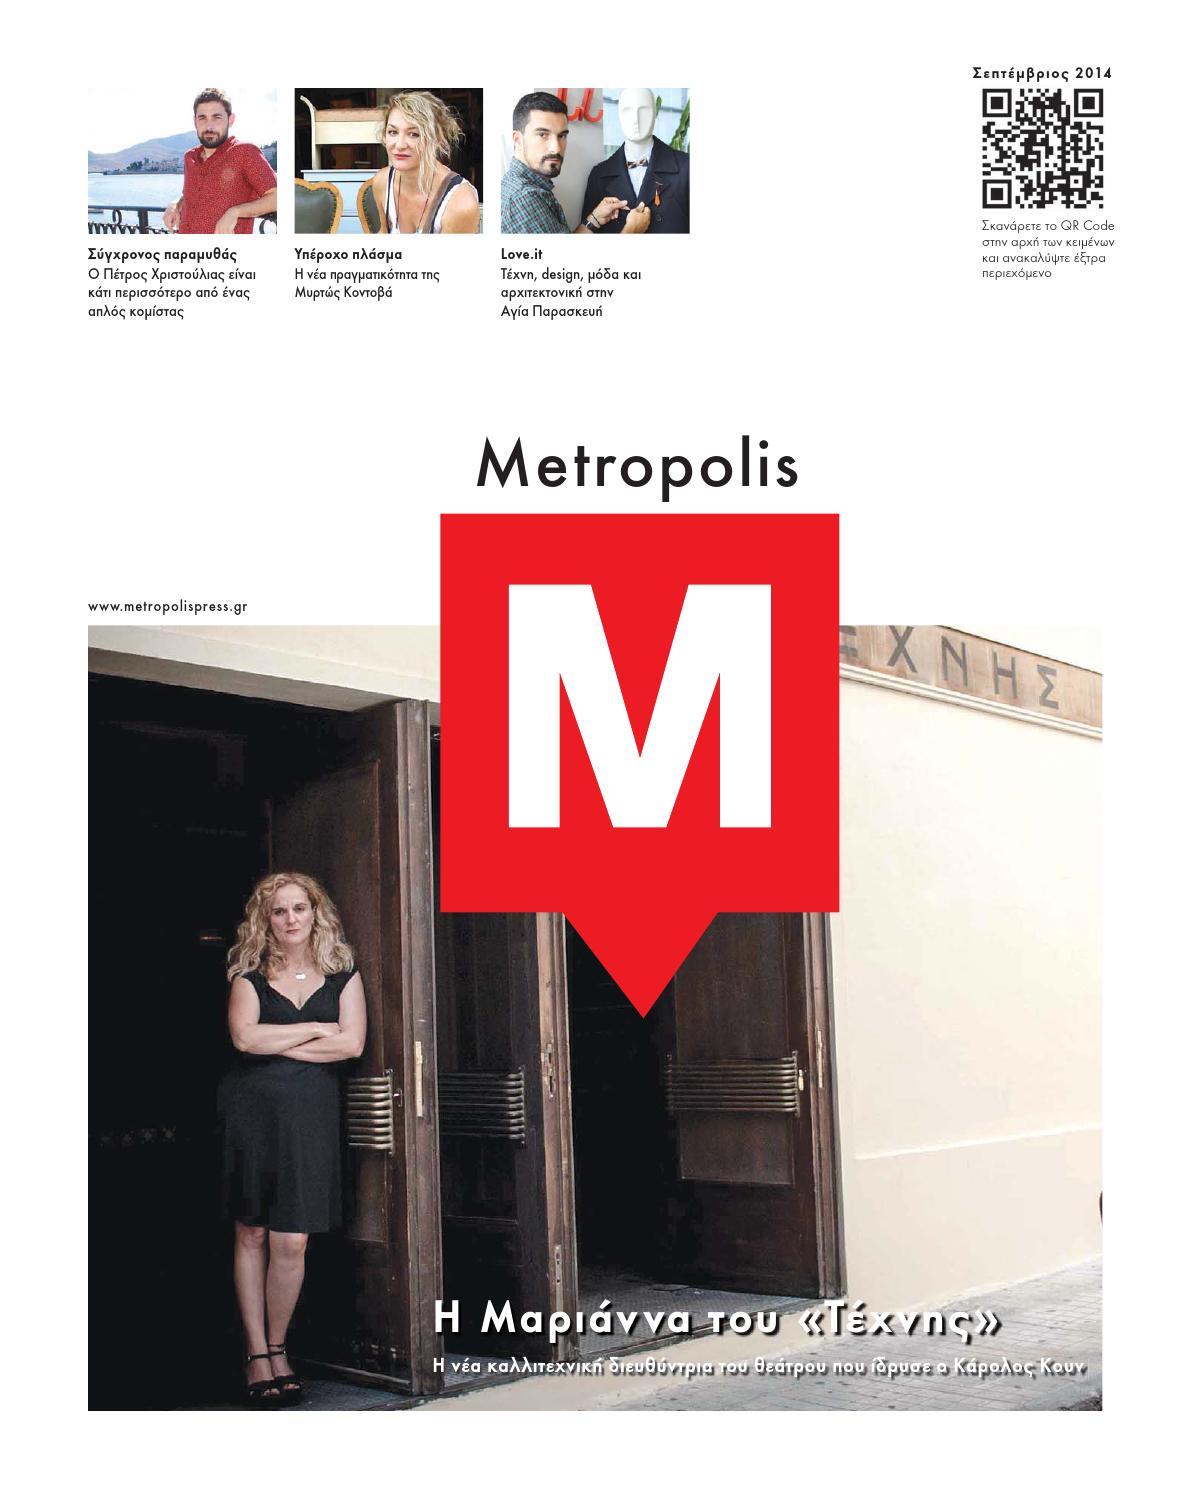 Metropolis Free Press - Σεπτέμβριος 2014 by Metropolis - issuu 7a92184283a